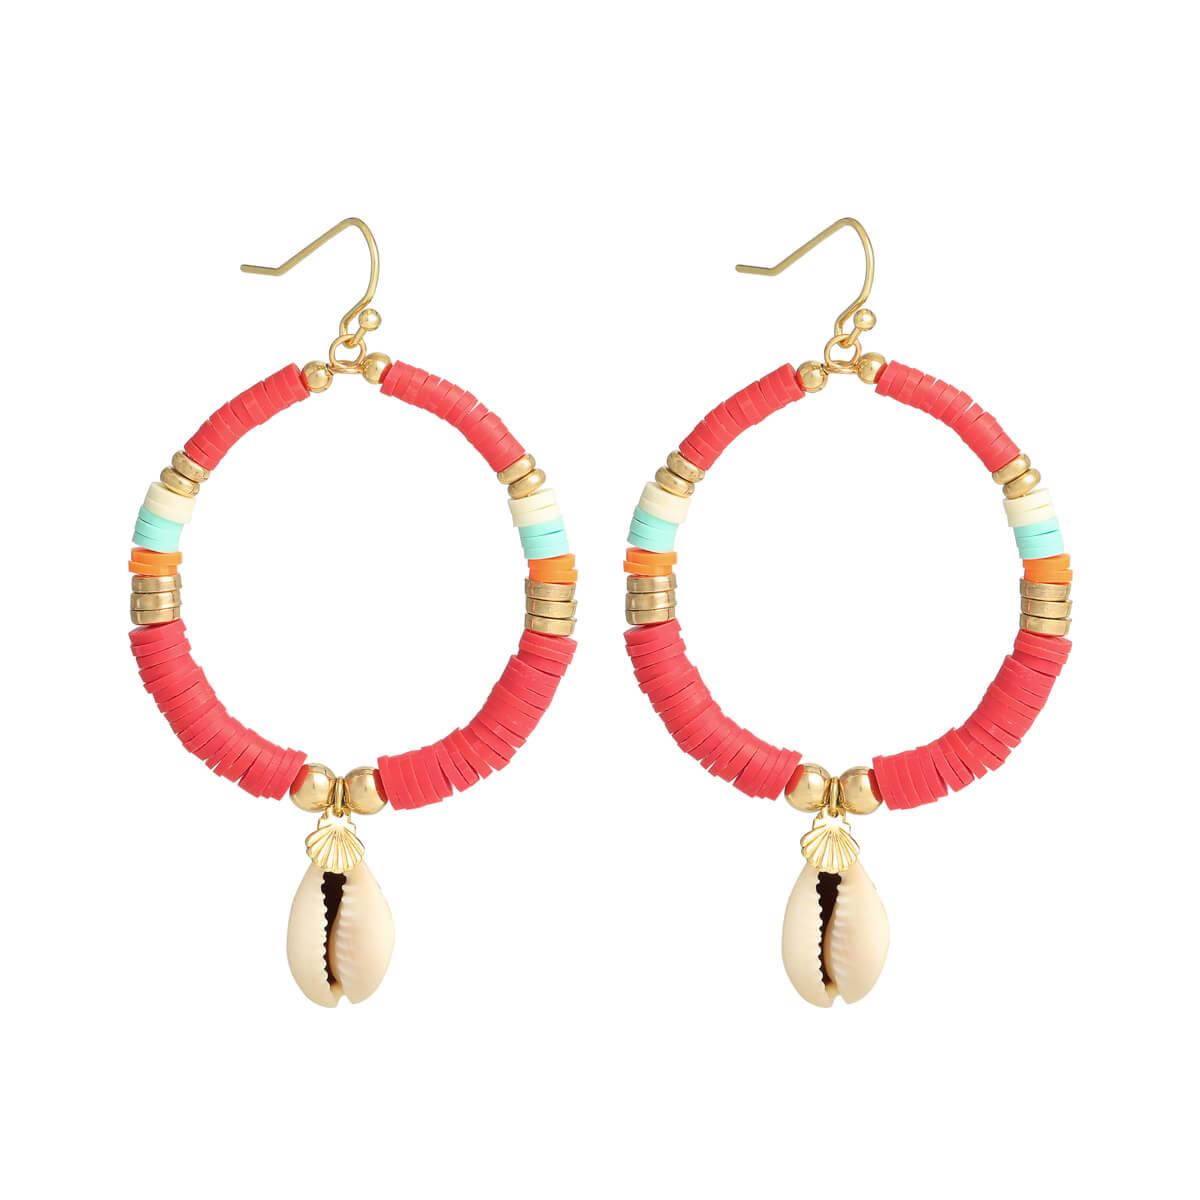 boucles d'oreilles perles heishi - boucle oreille Cénélia - bijou surfeuse - Moana